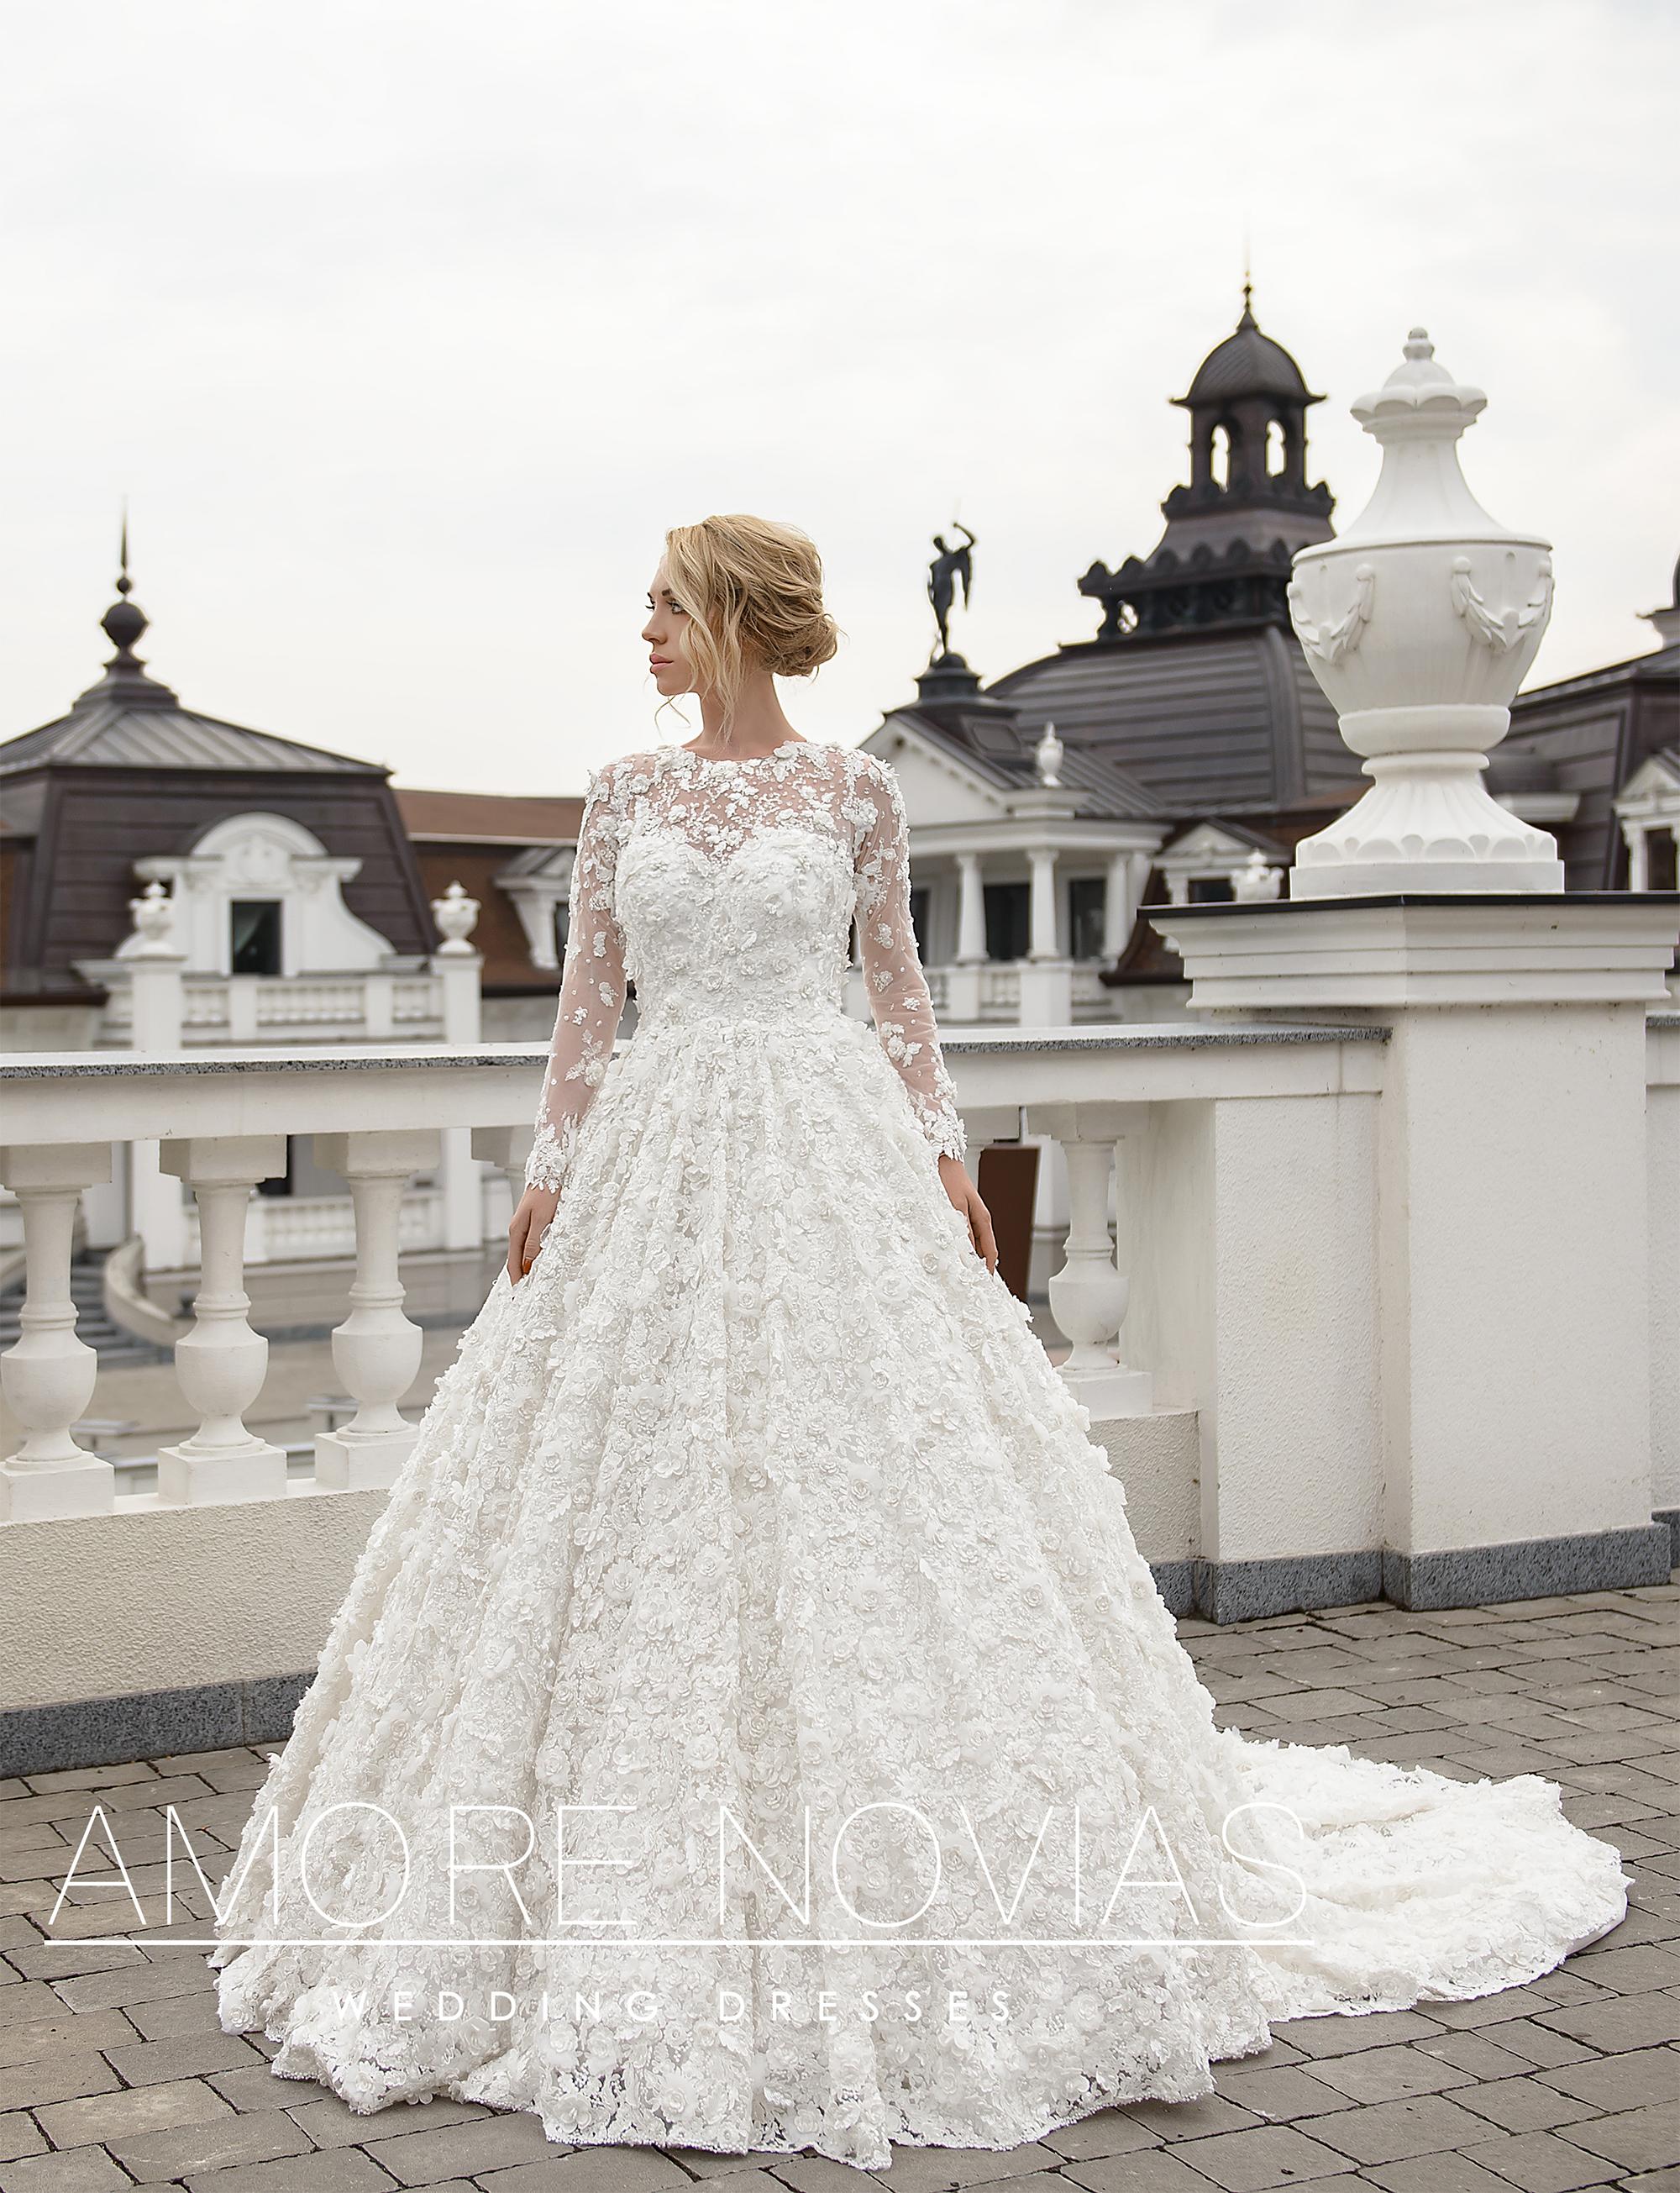 http://amore-novias.com/images/stories/virtuemart/product/lux003--------(1-2).jpg